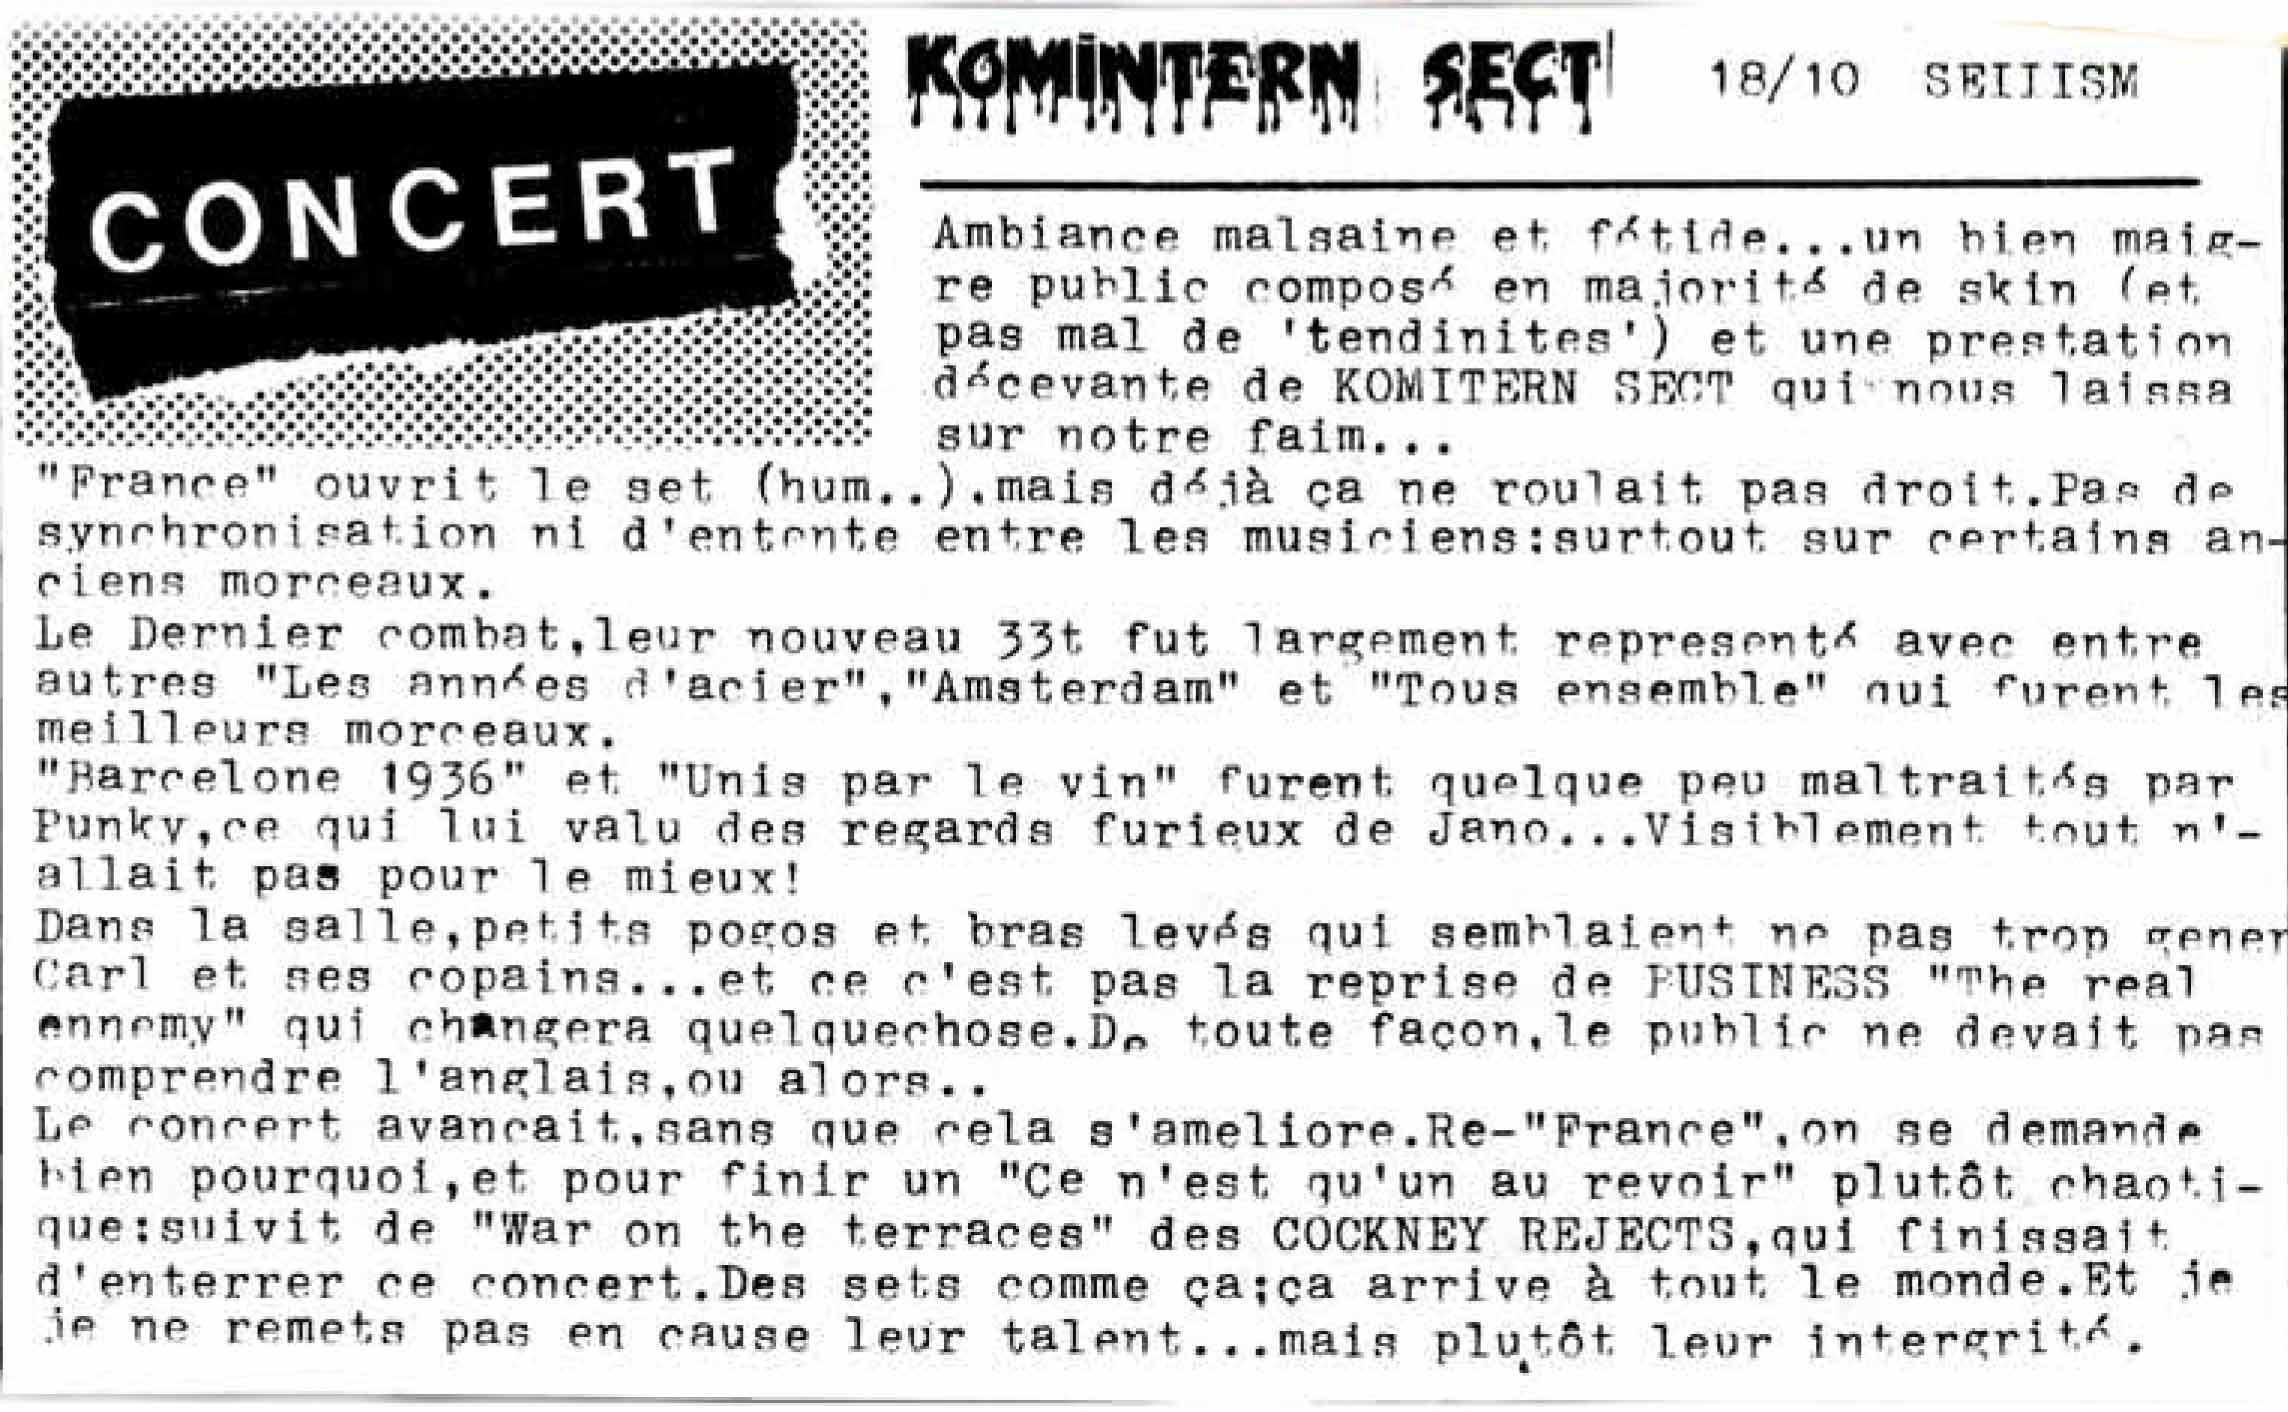 1985_10_18_zz_Article